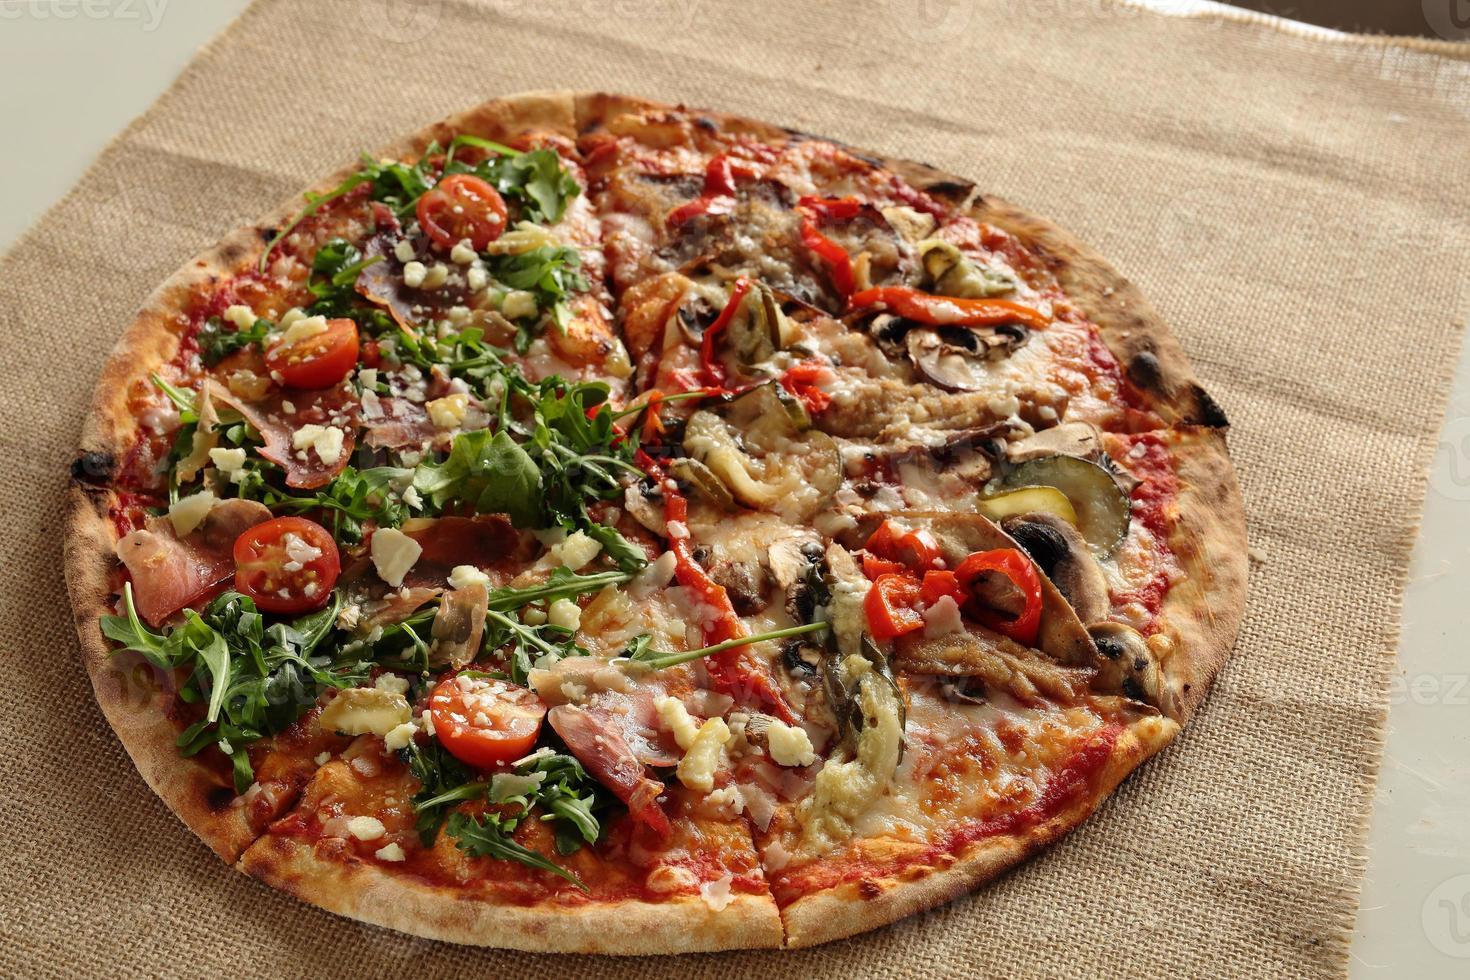 pizza casera con planta de rúcula foto